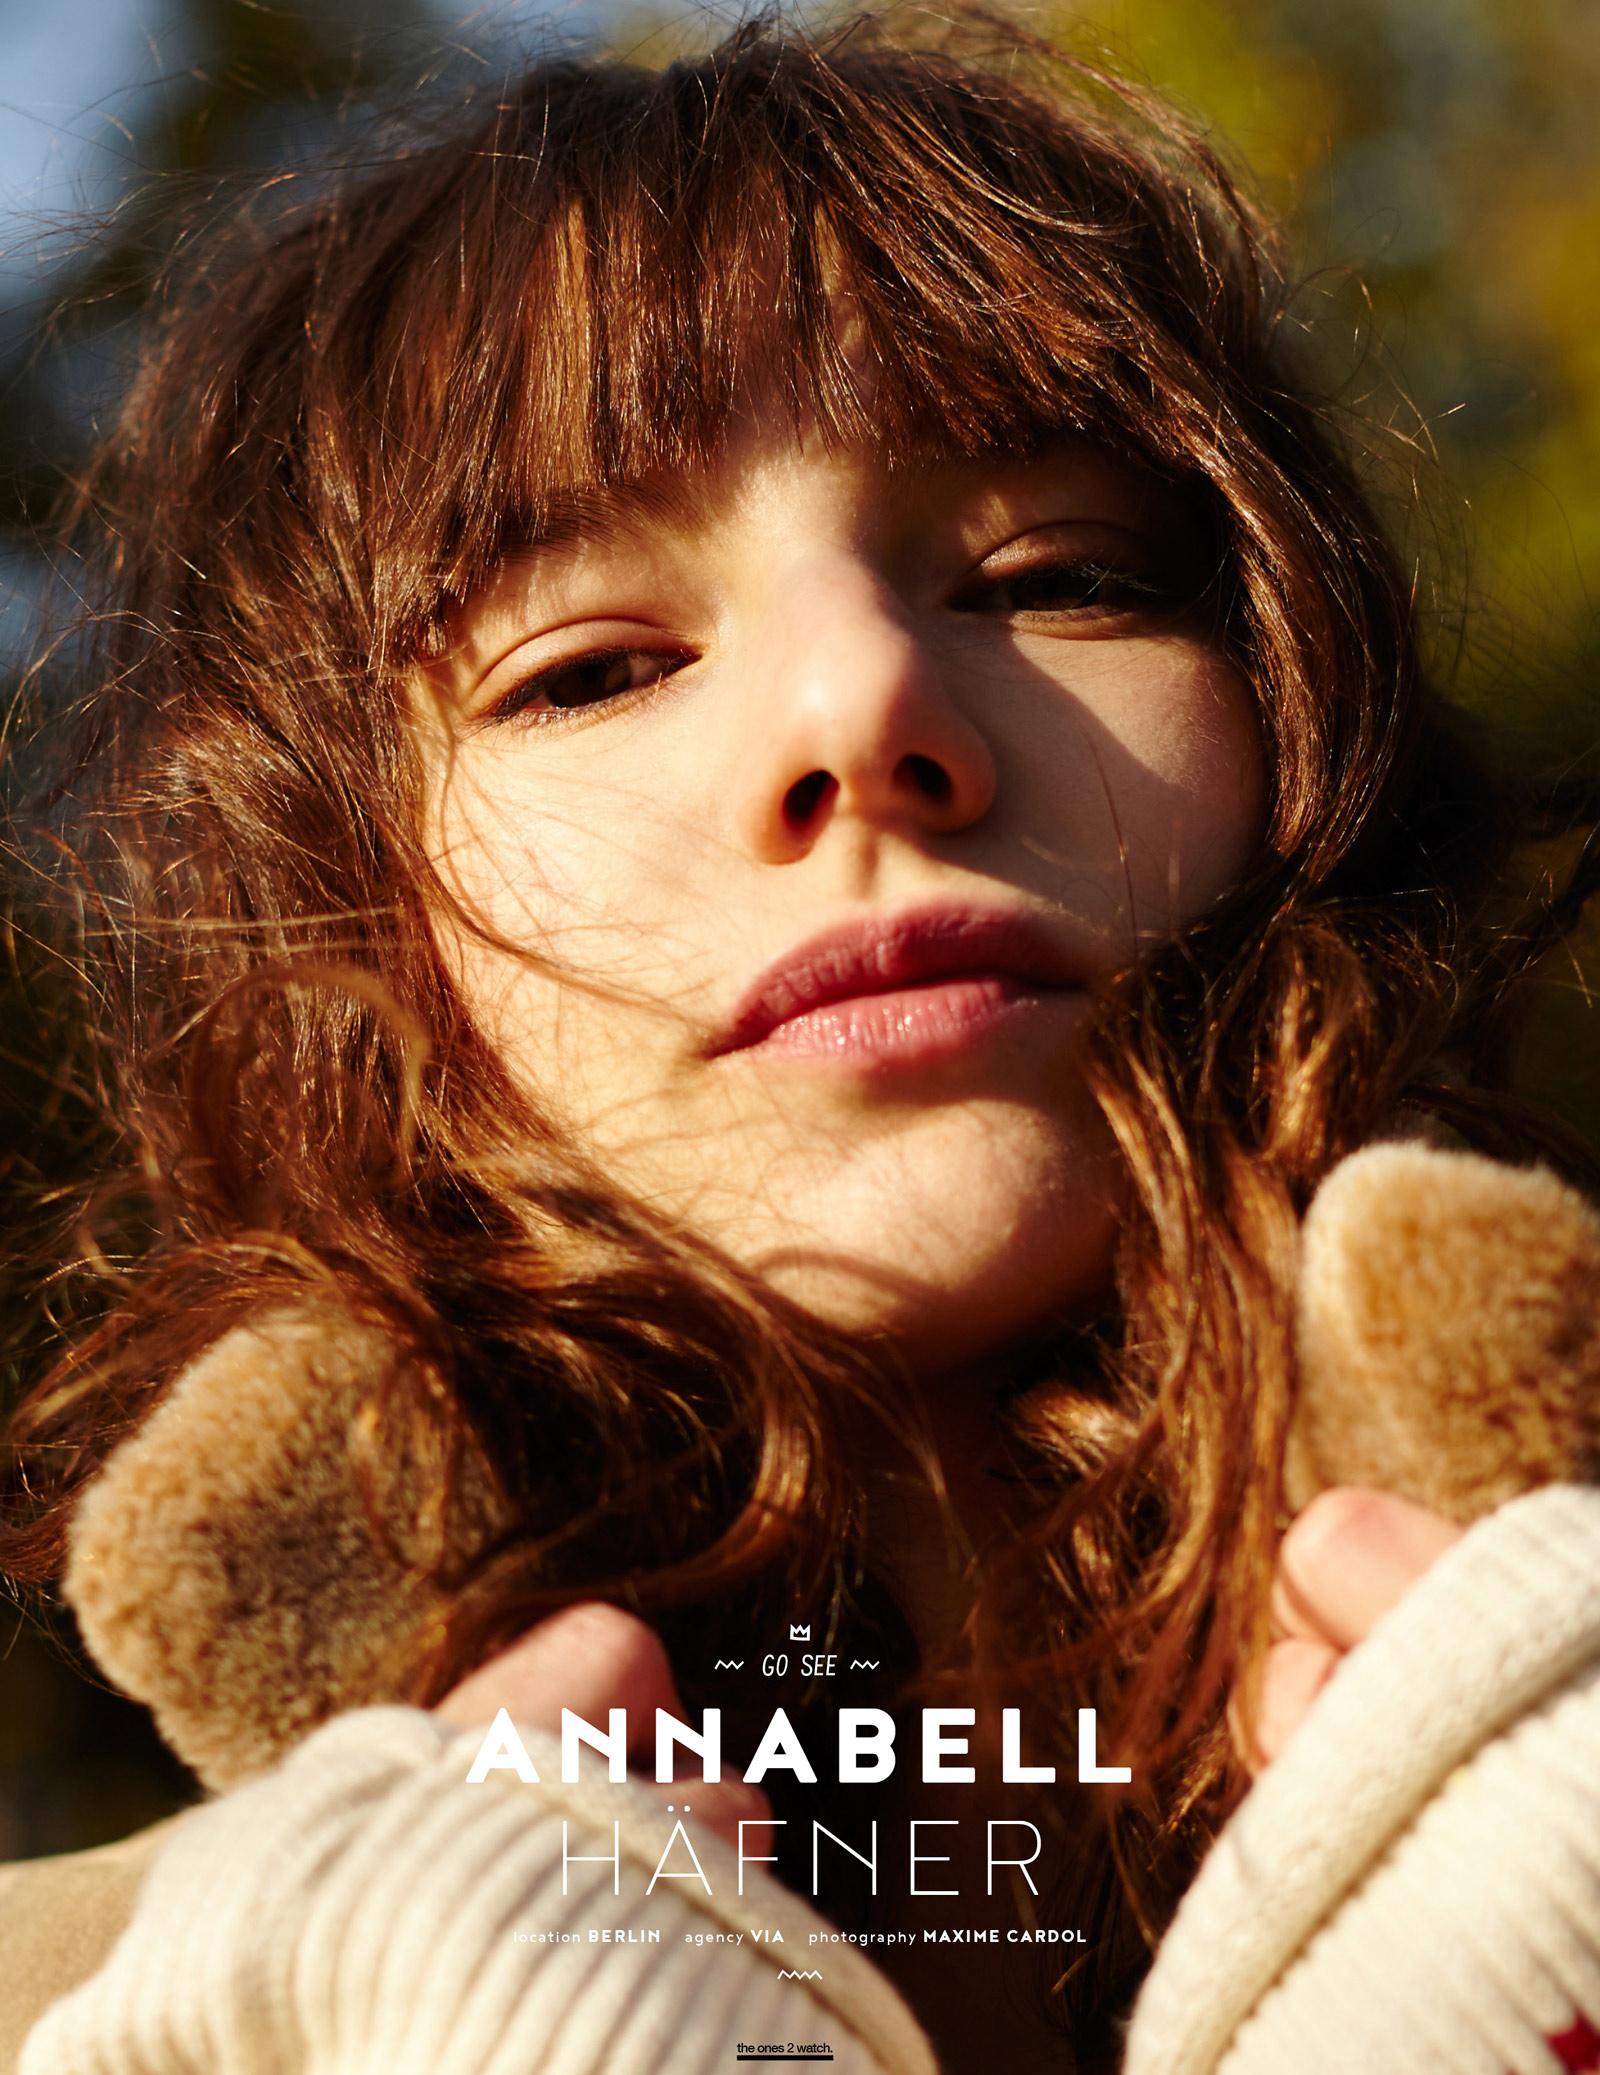 Duhks - Annabel Lyrics | MetroLyrics